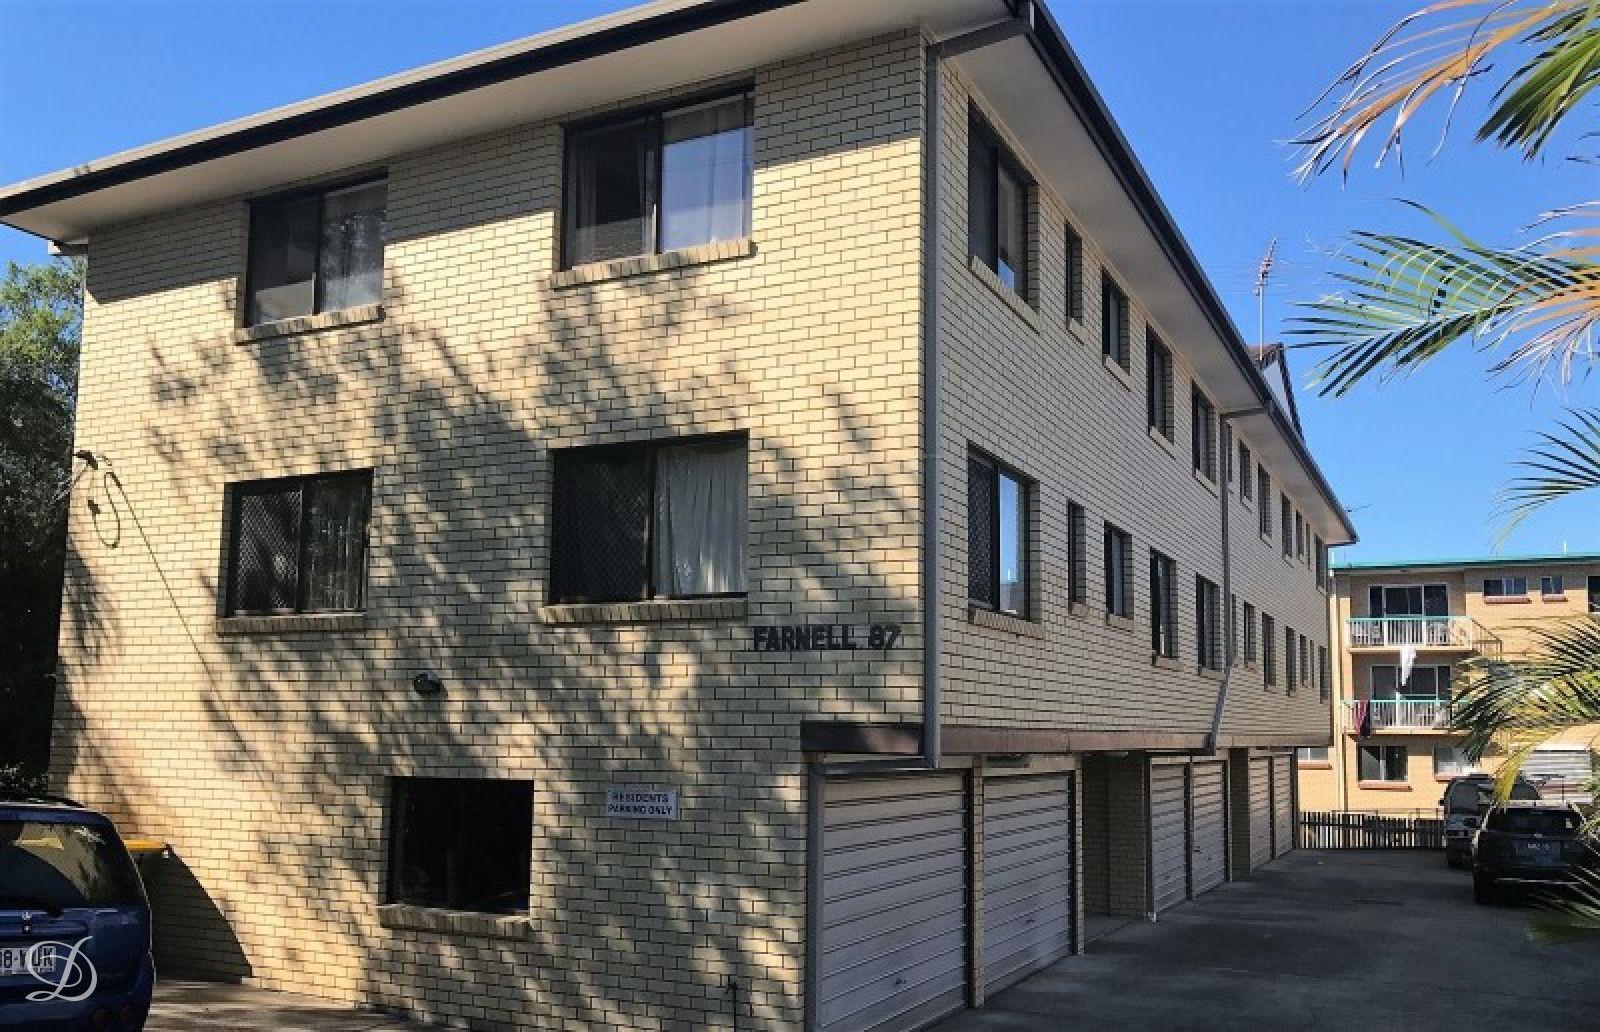 6/87 Farnell Street, Chermside QLD 4032, Image 0